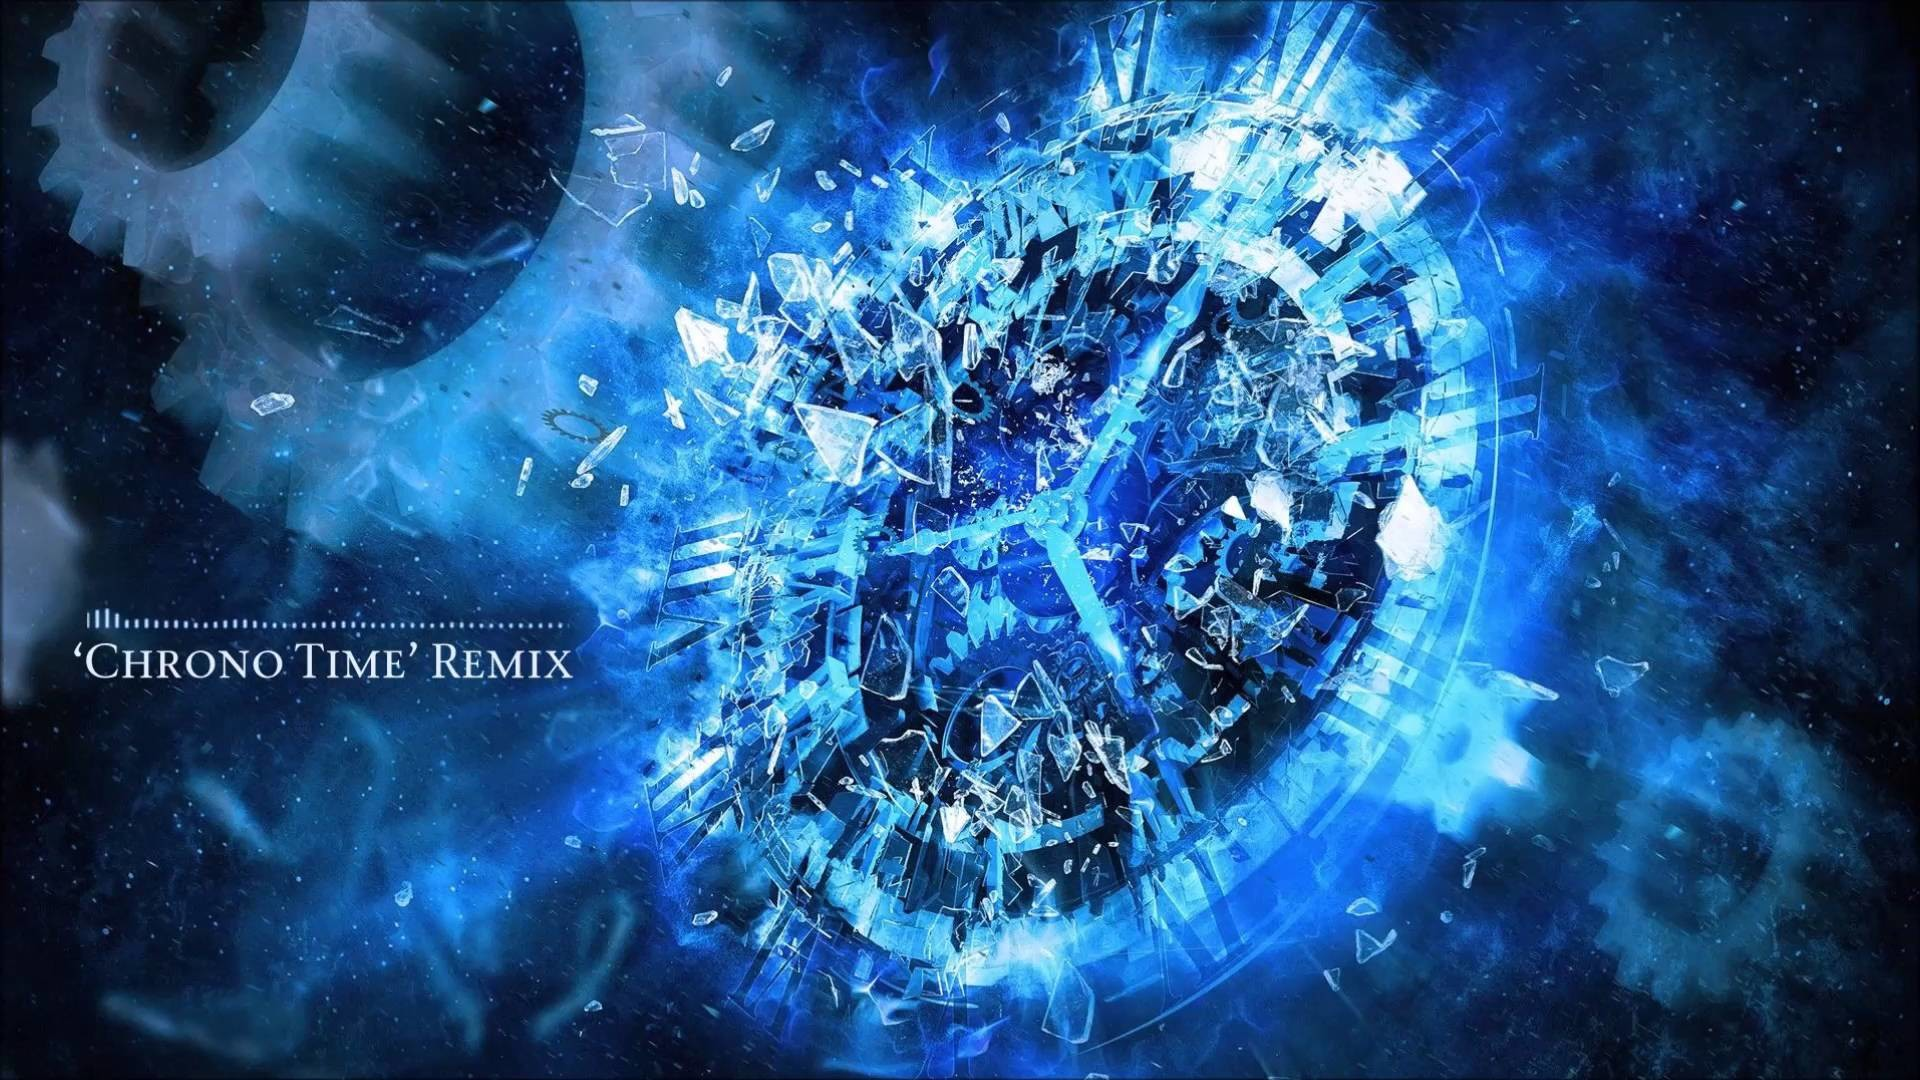 Chrono Trigger & Chrono Cross Remix Collection (2016)